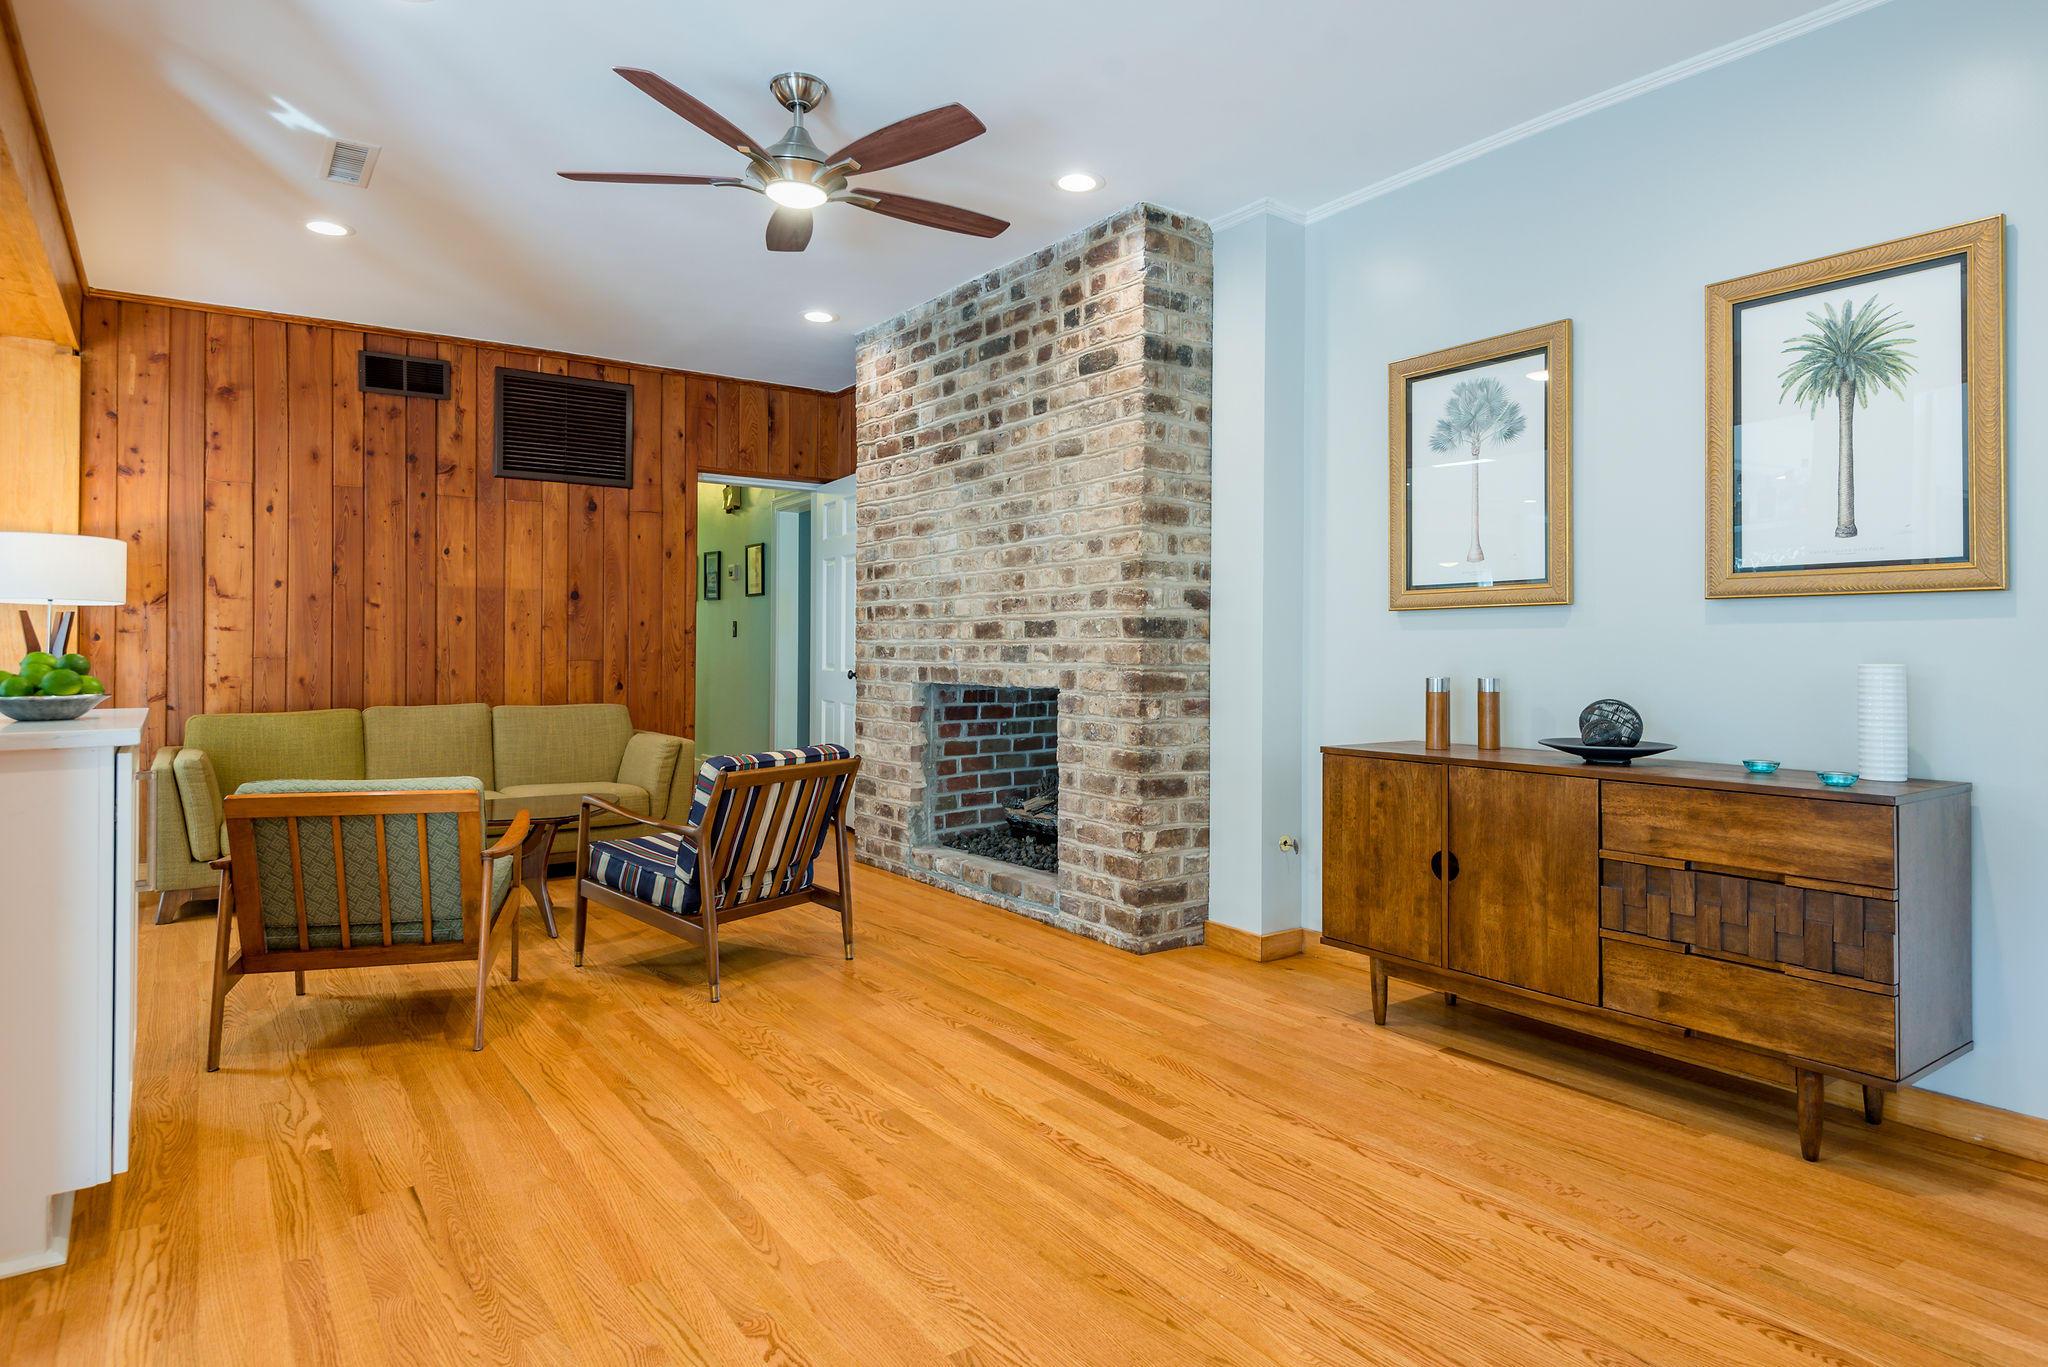 Sylvan Shores Homes For Sale - 450 Polony, Charleston, SC - 16